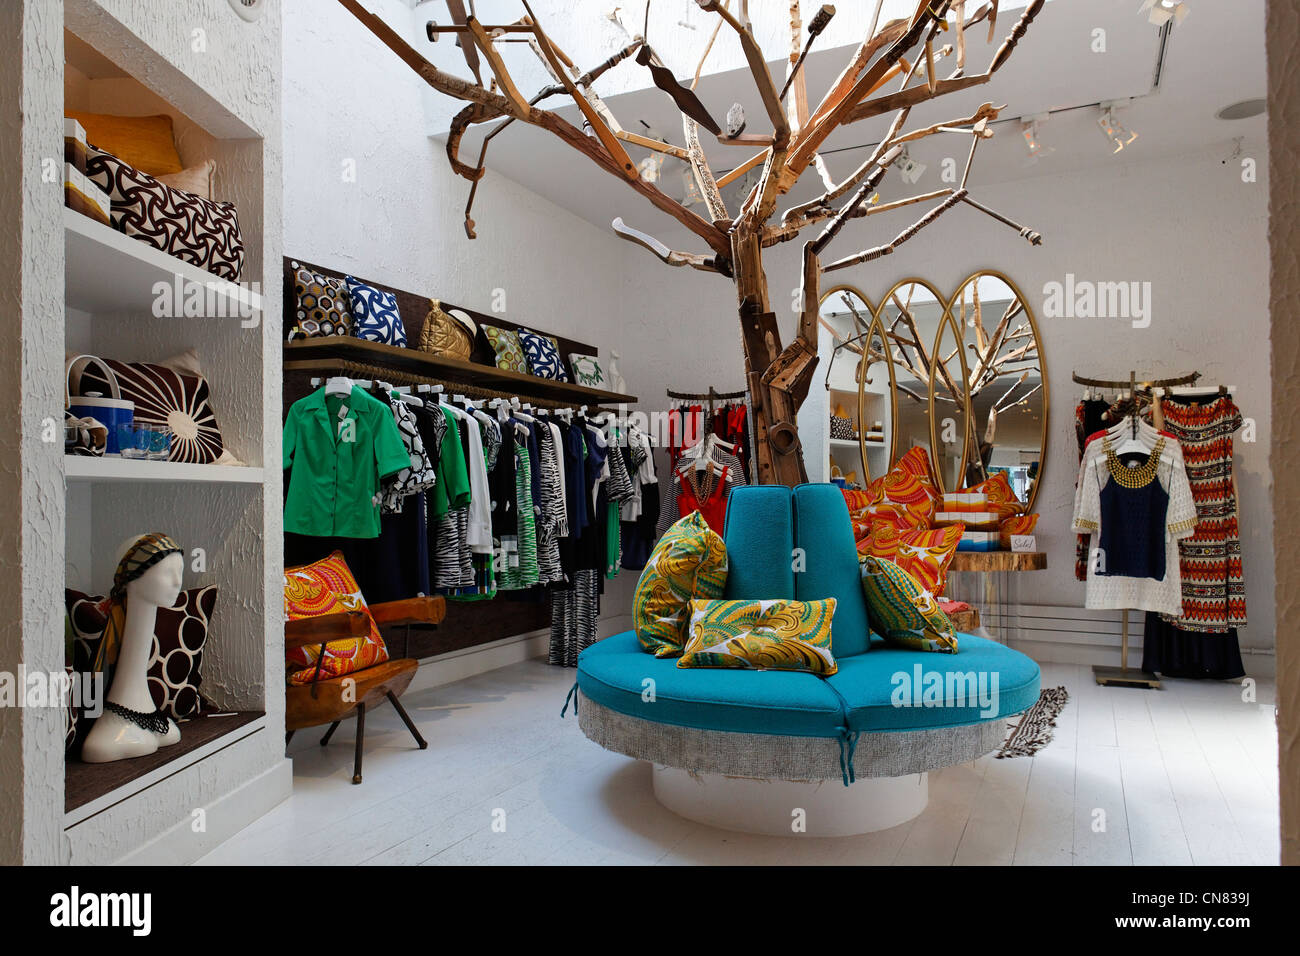 United States, New York City, Manhattan, Meatpacking District, Trina Turk  Fashion Store, 67 Gansevoort Street